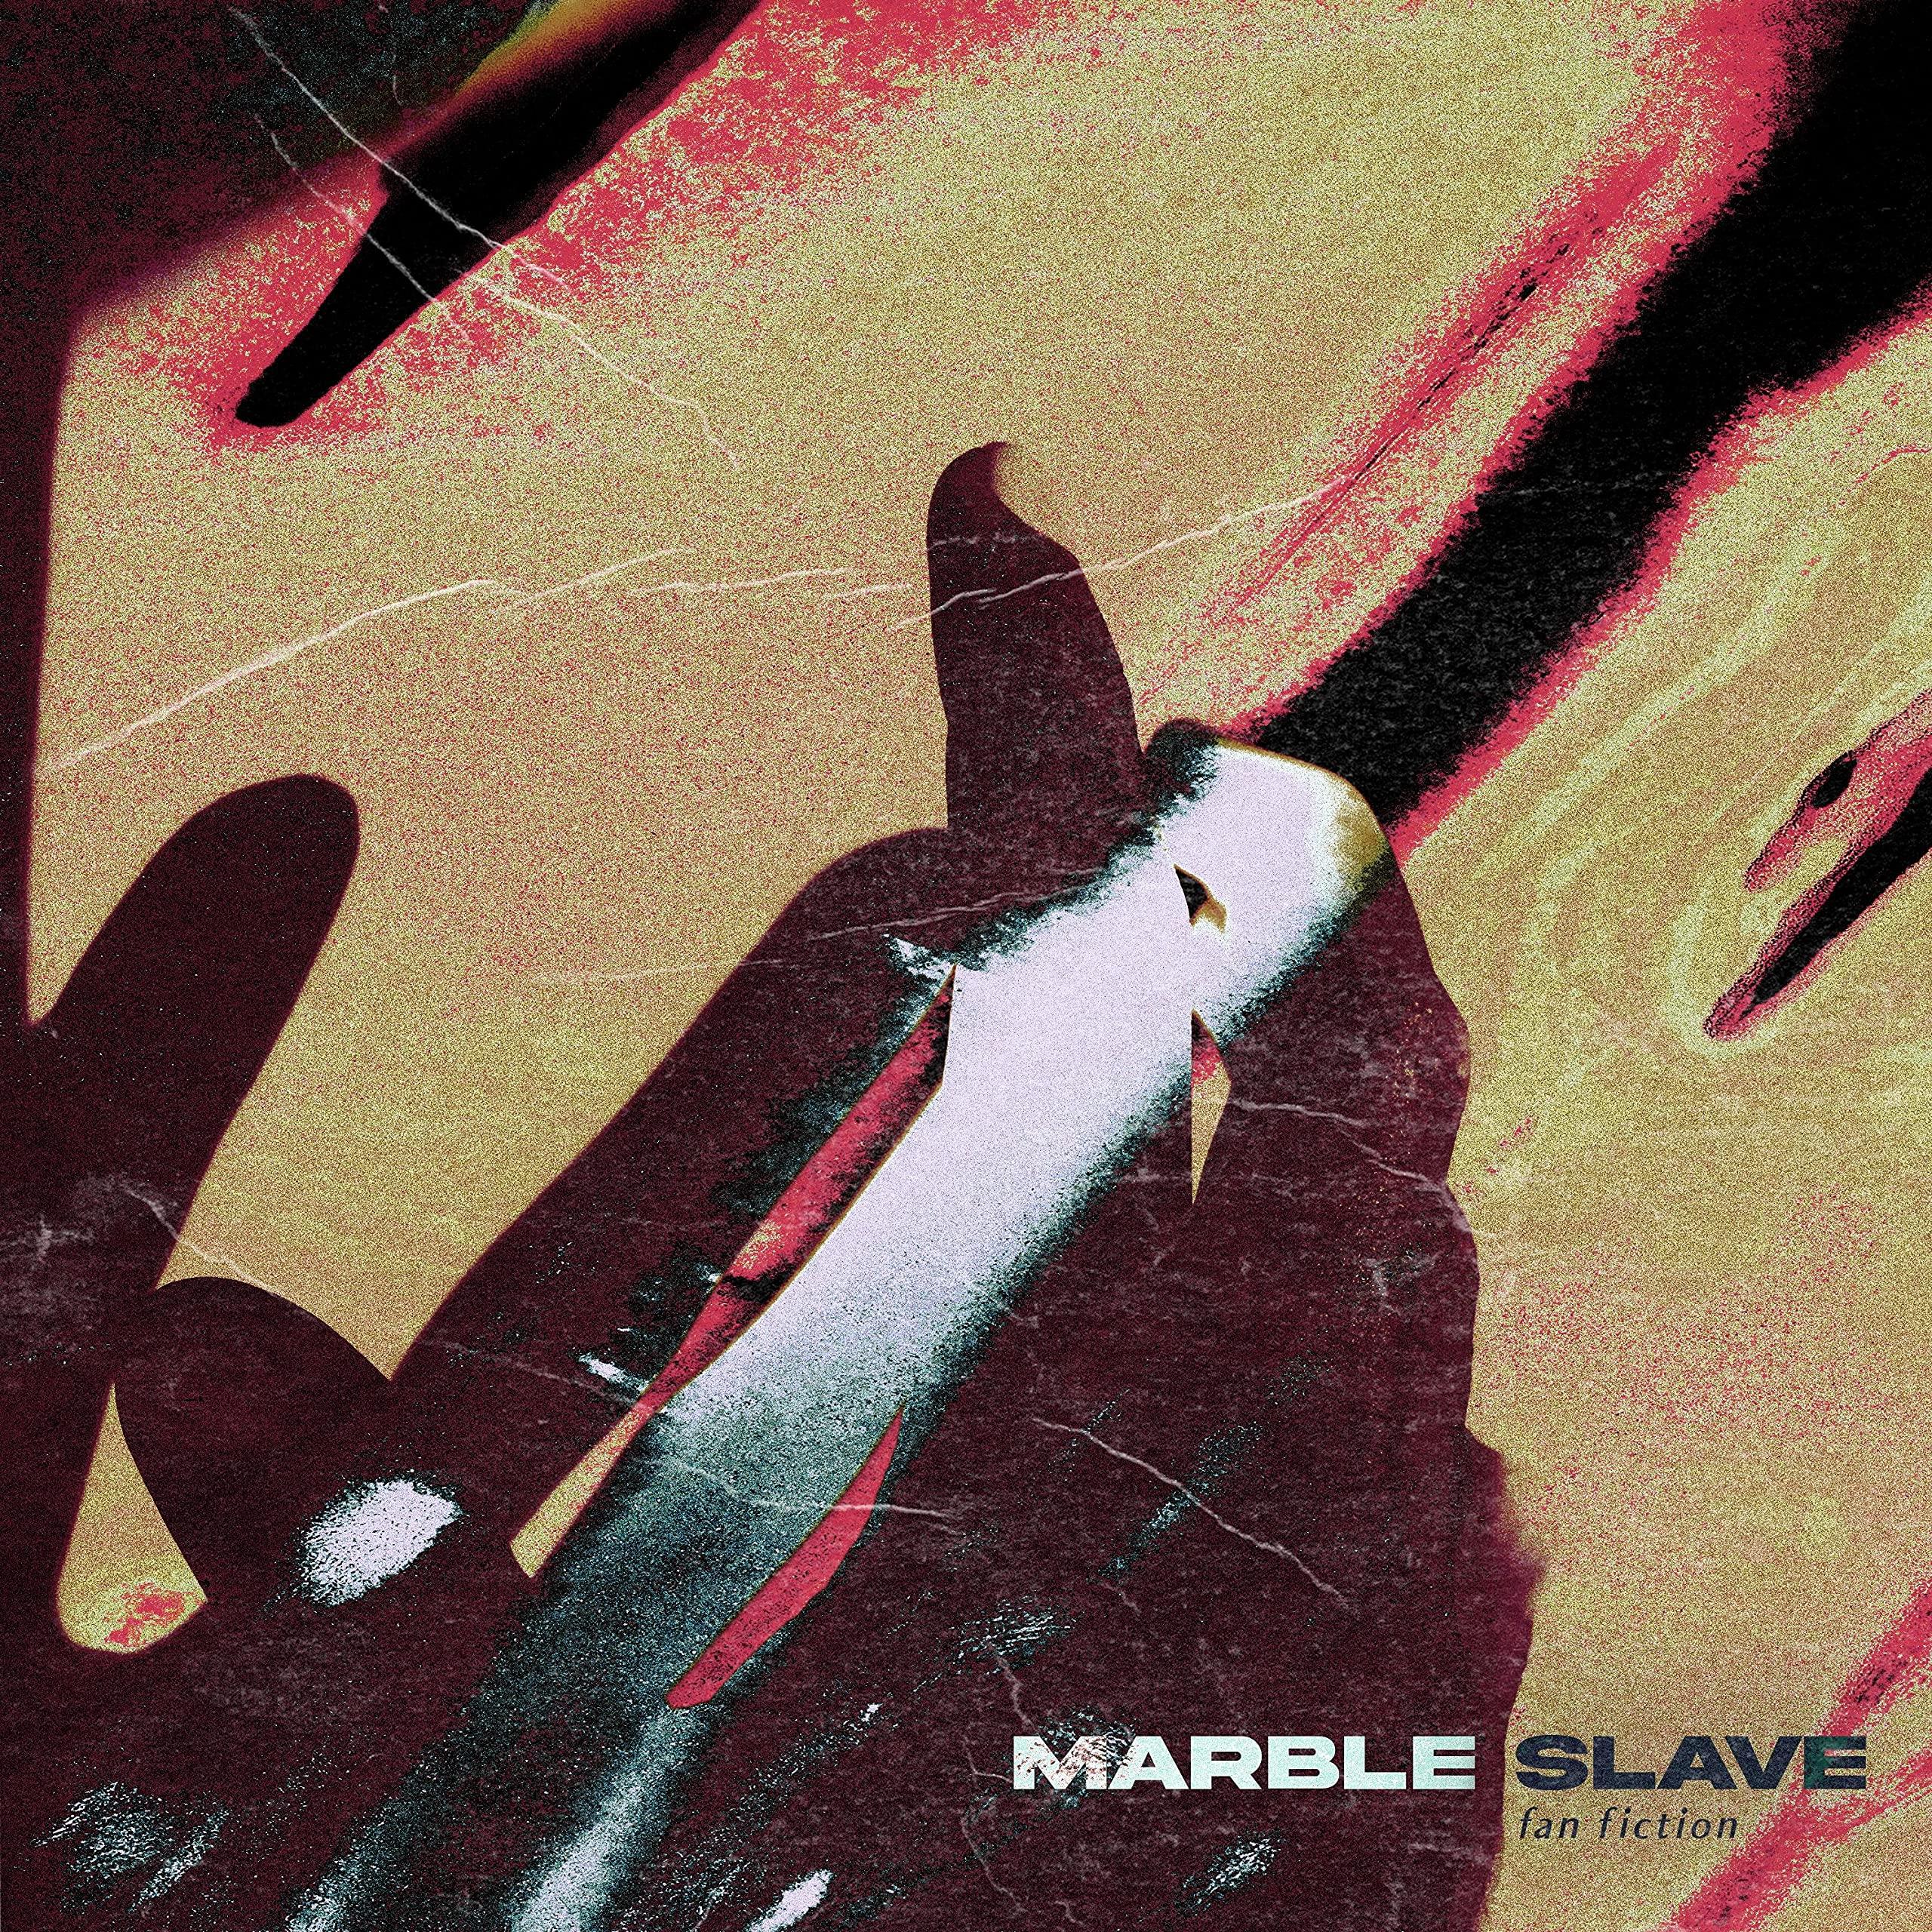 Marble Slave - Fan Fiction (2021) [FLAC] Download